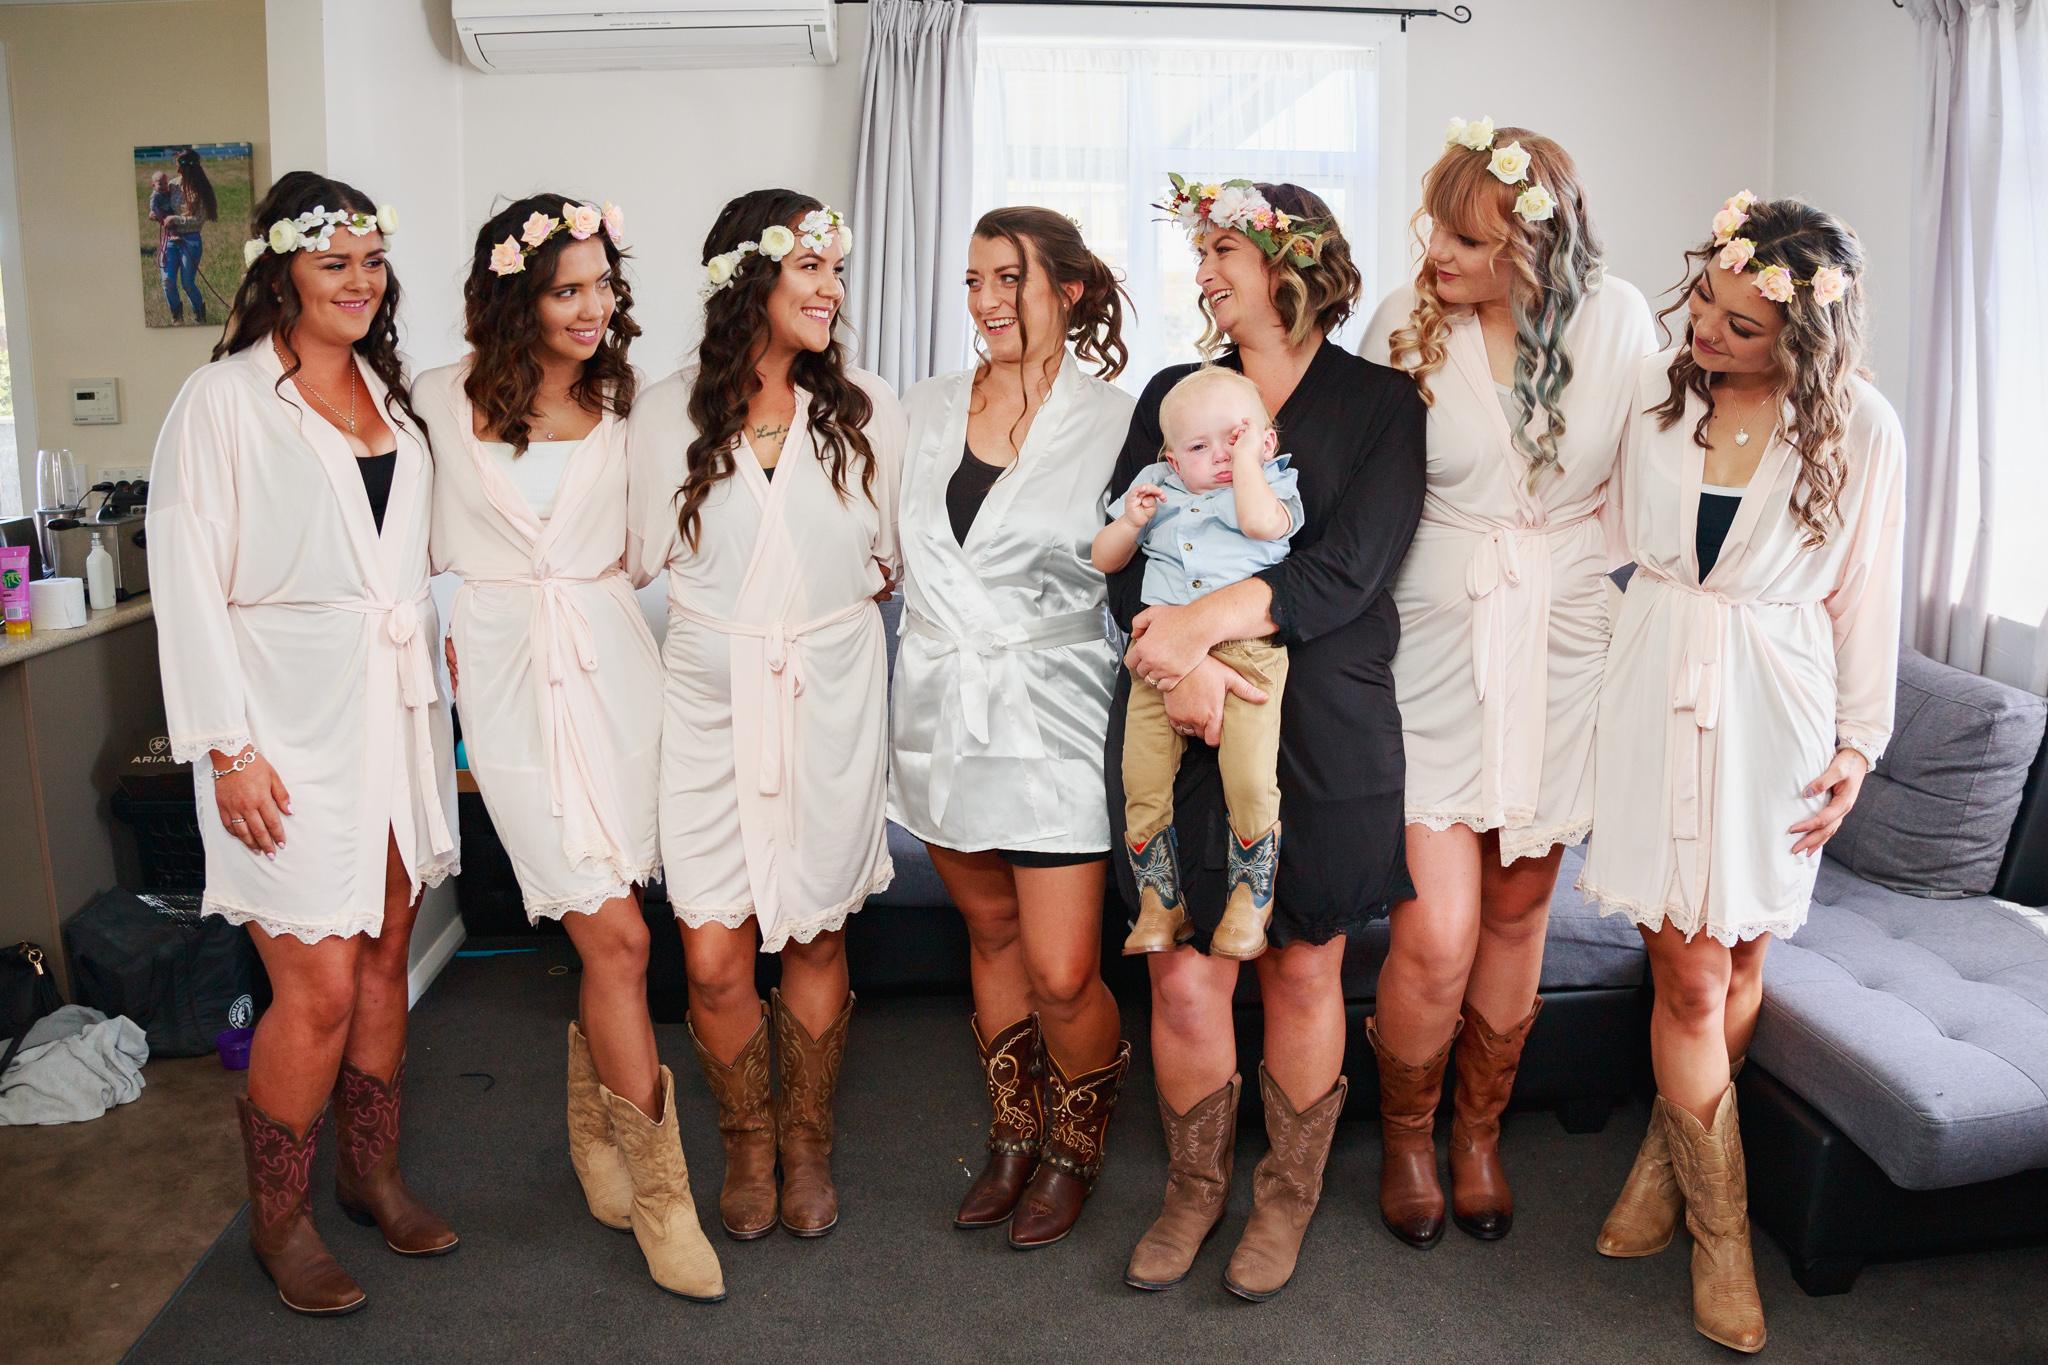 whanganui-wedding-photographer-highlight-photography-new-zealand.jpg